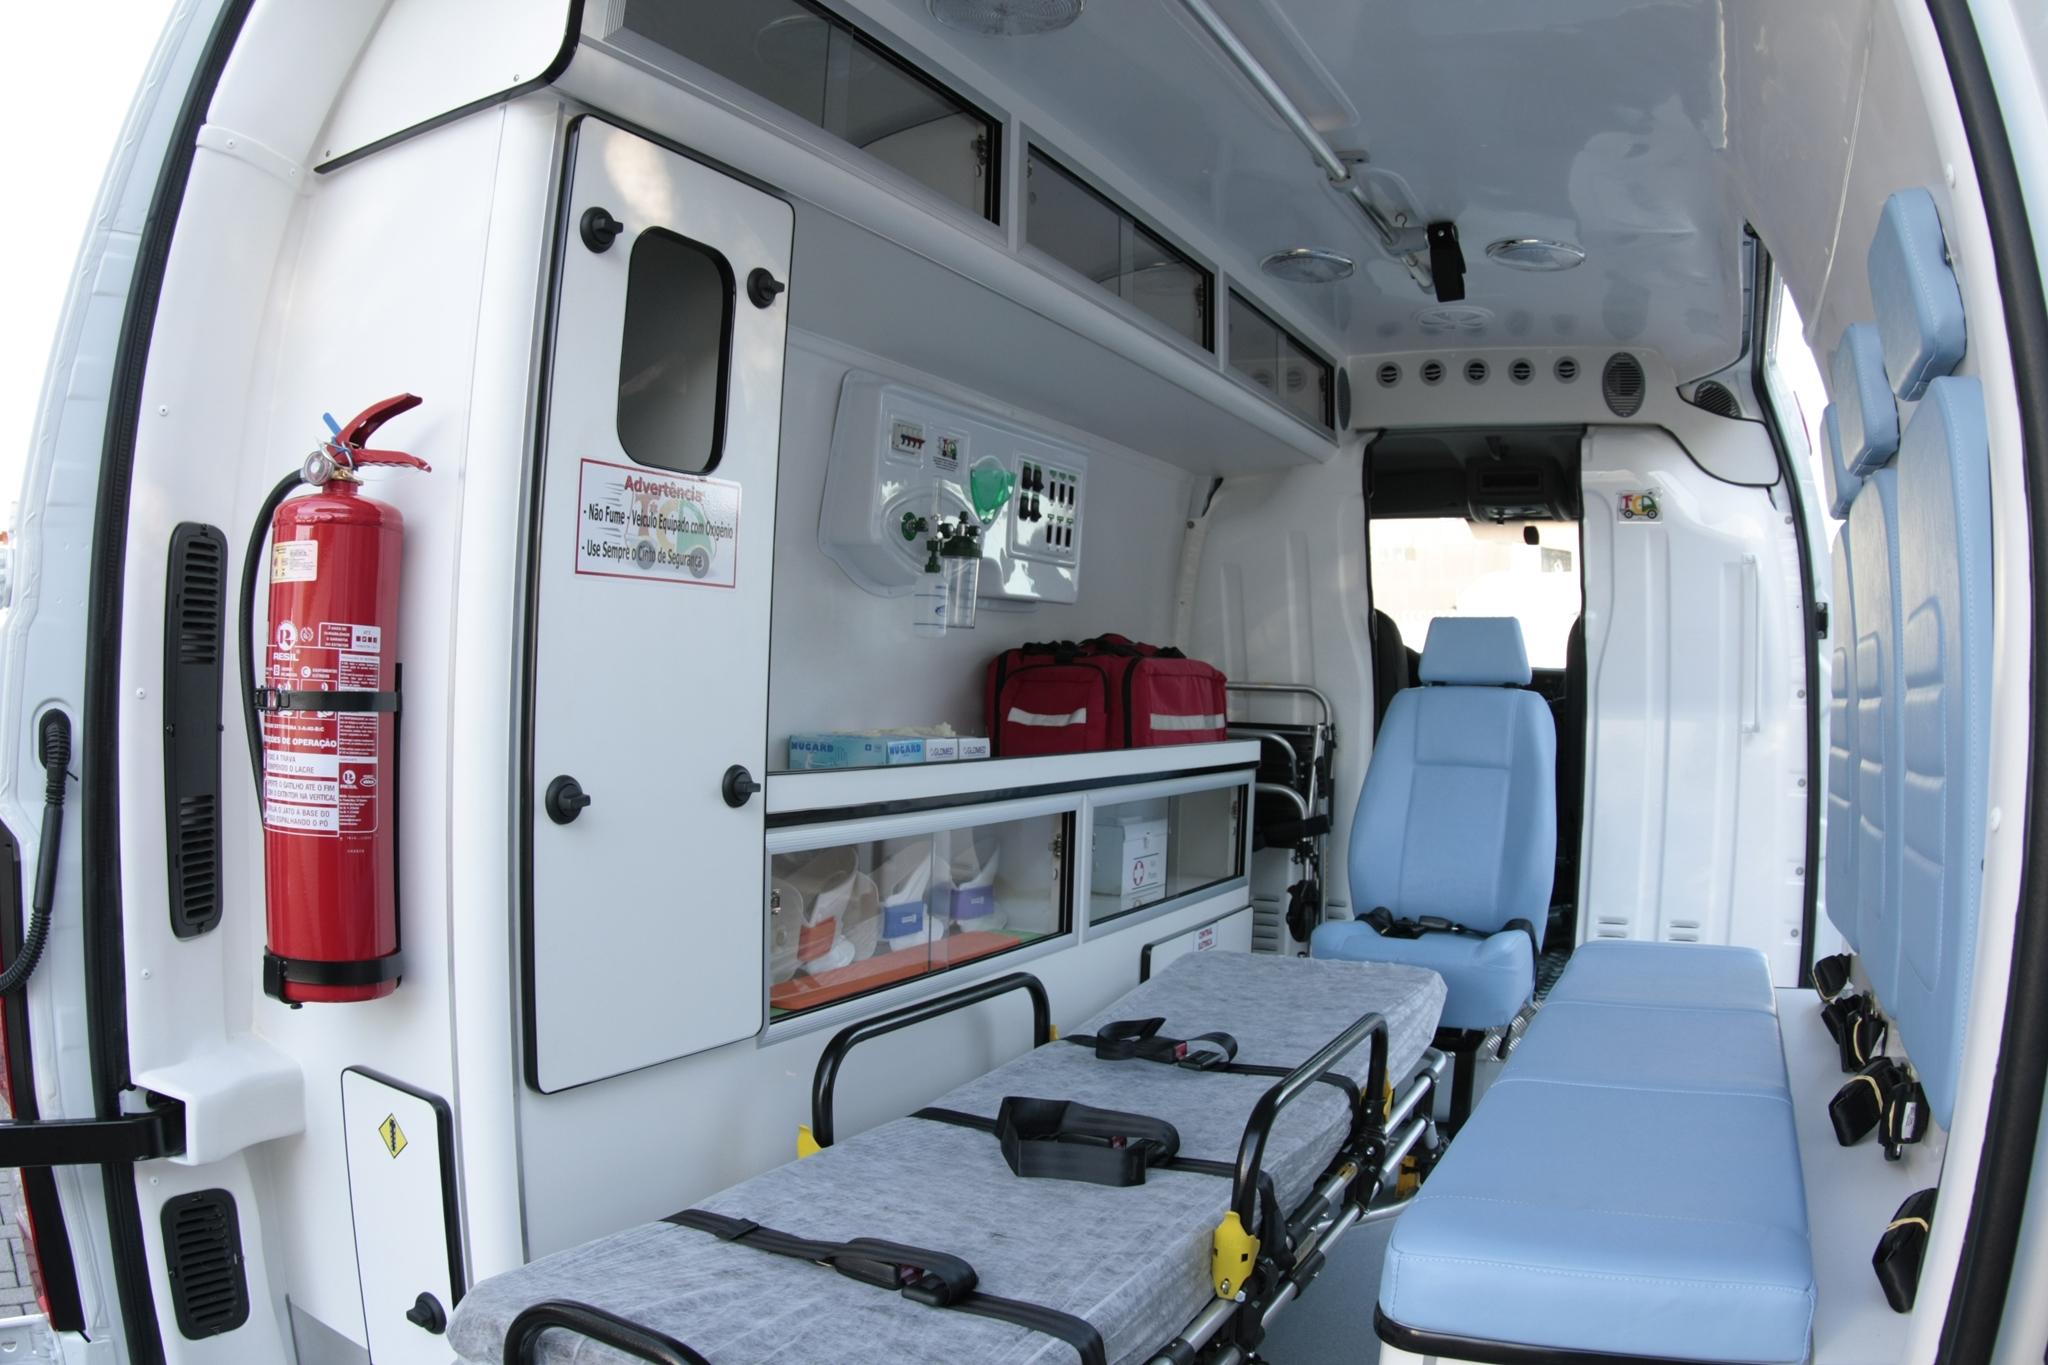 Nova Ambulância será entregue à Secretaria de Saúde